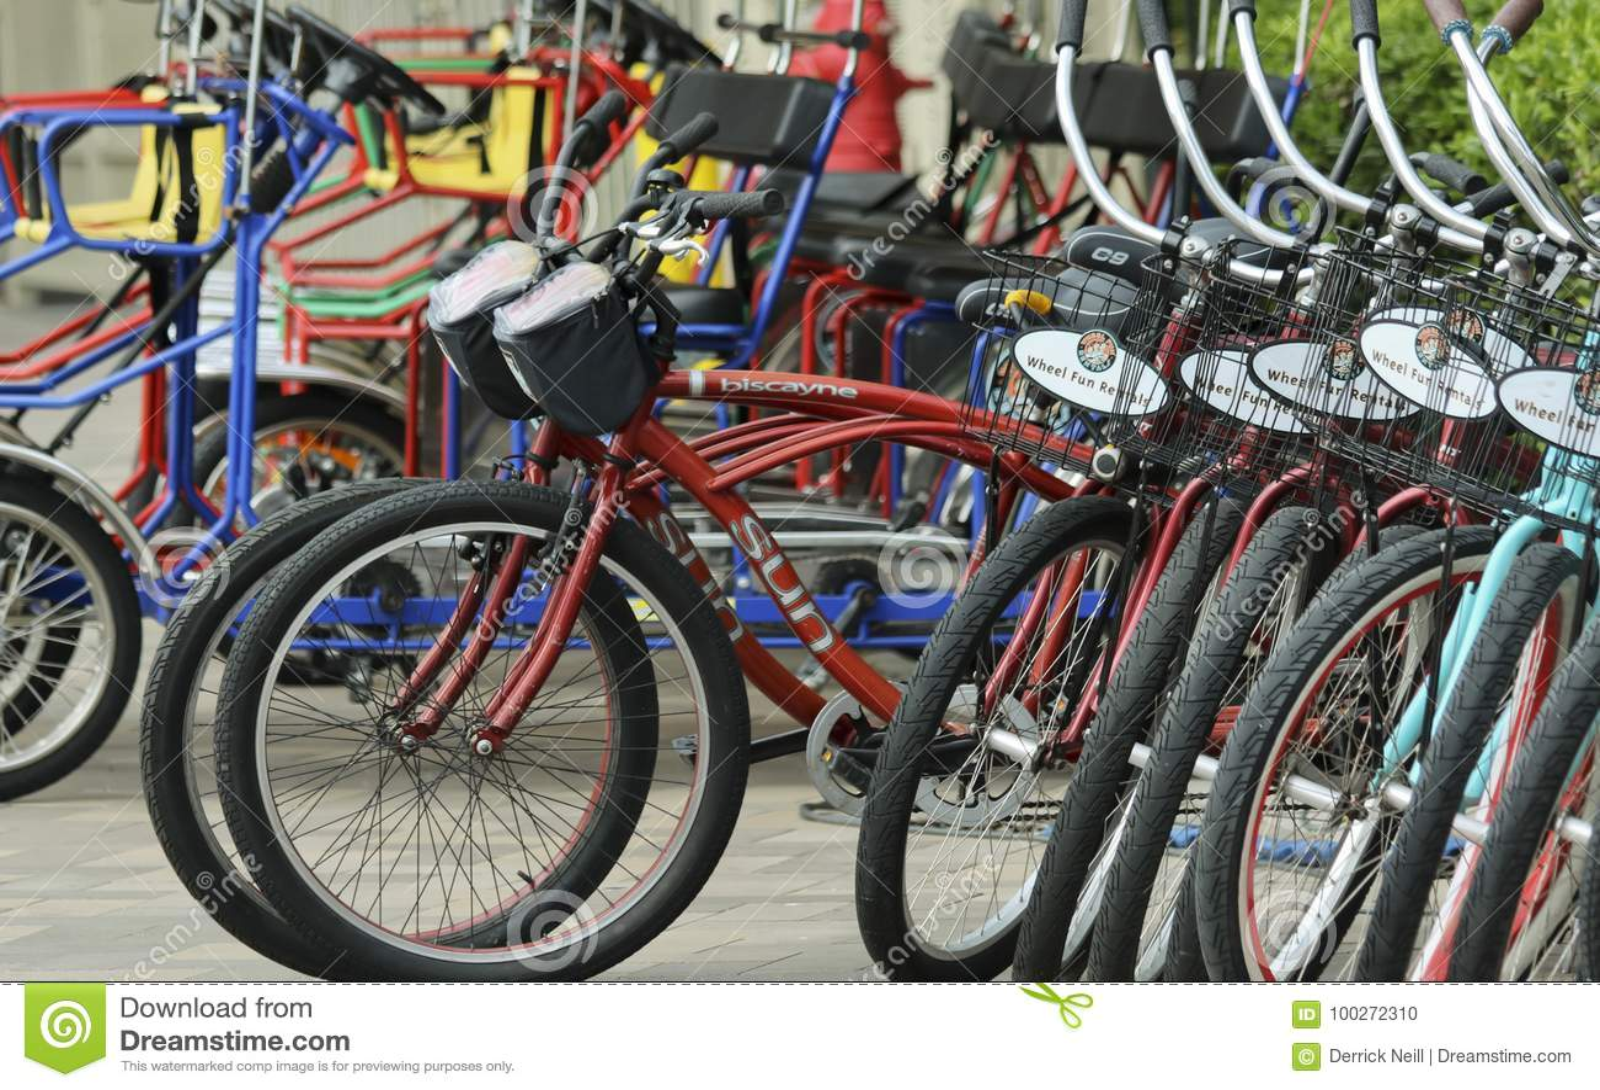 A Wheels of Fun Bike Rental Stand, Marriott Marquis and Marina